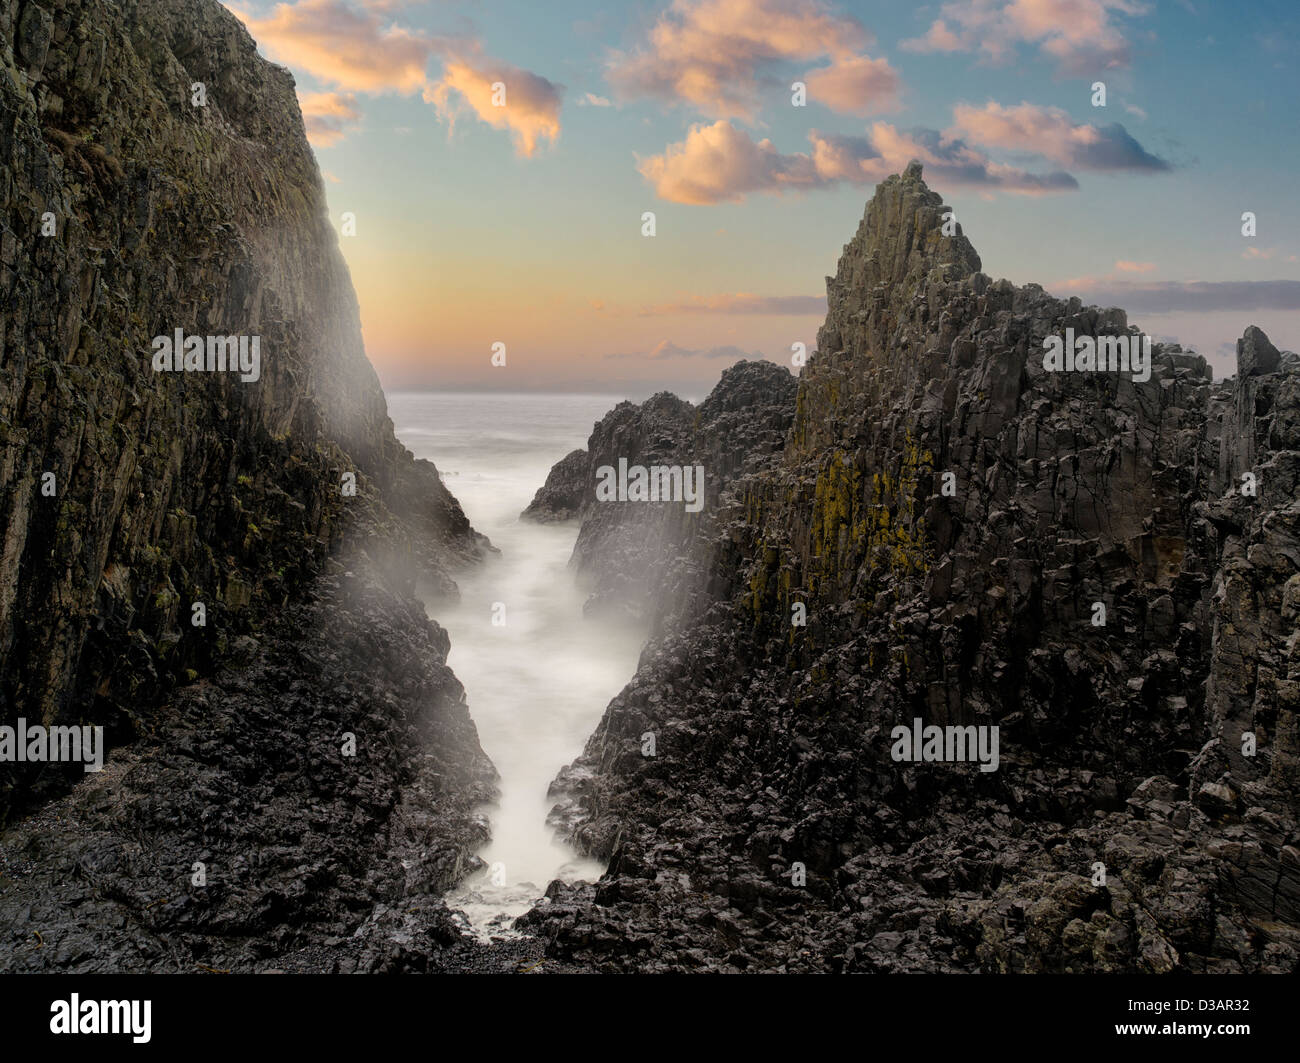 Rock formations at Seal Rock. Oregon - Stock Image